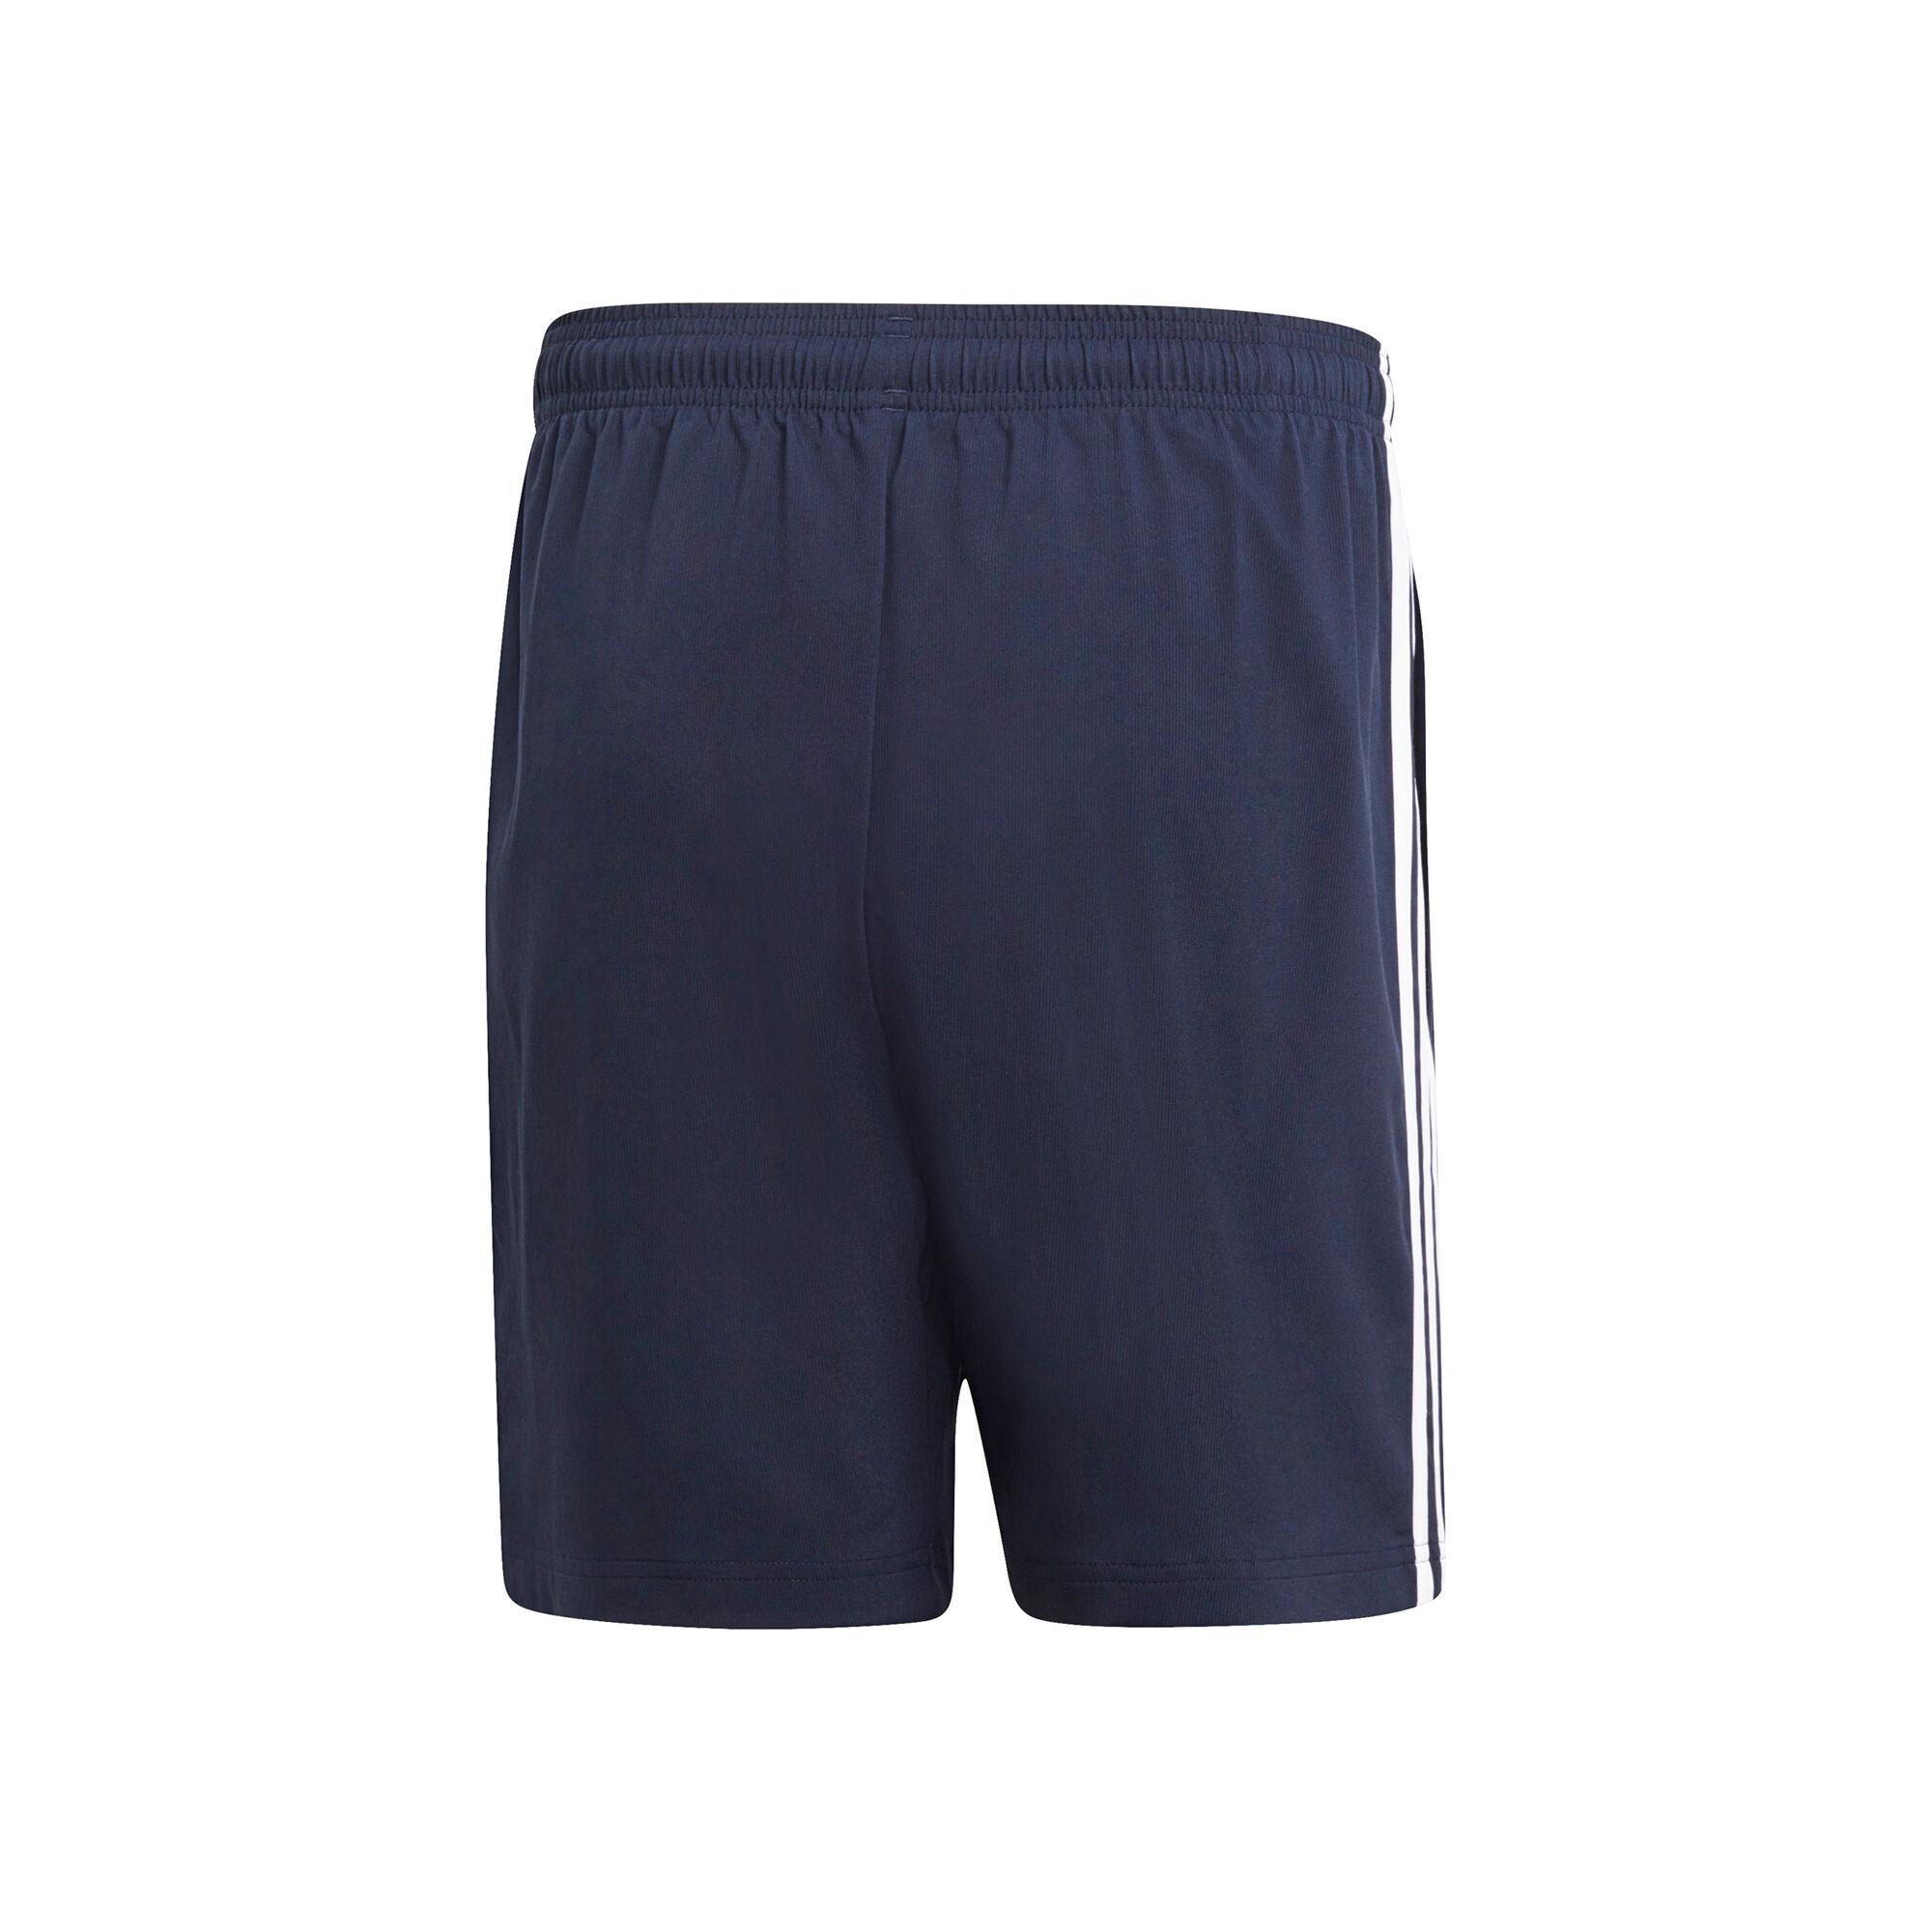 4379a8dc1d buy adidas Essentials 3-Stripes Chelsea Shorts Men - Dark Blue ...